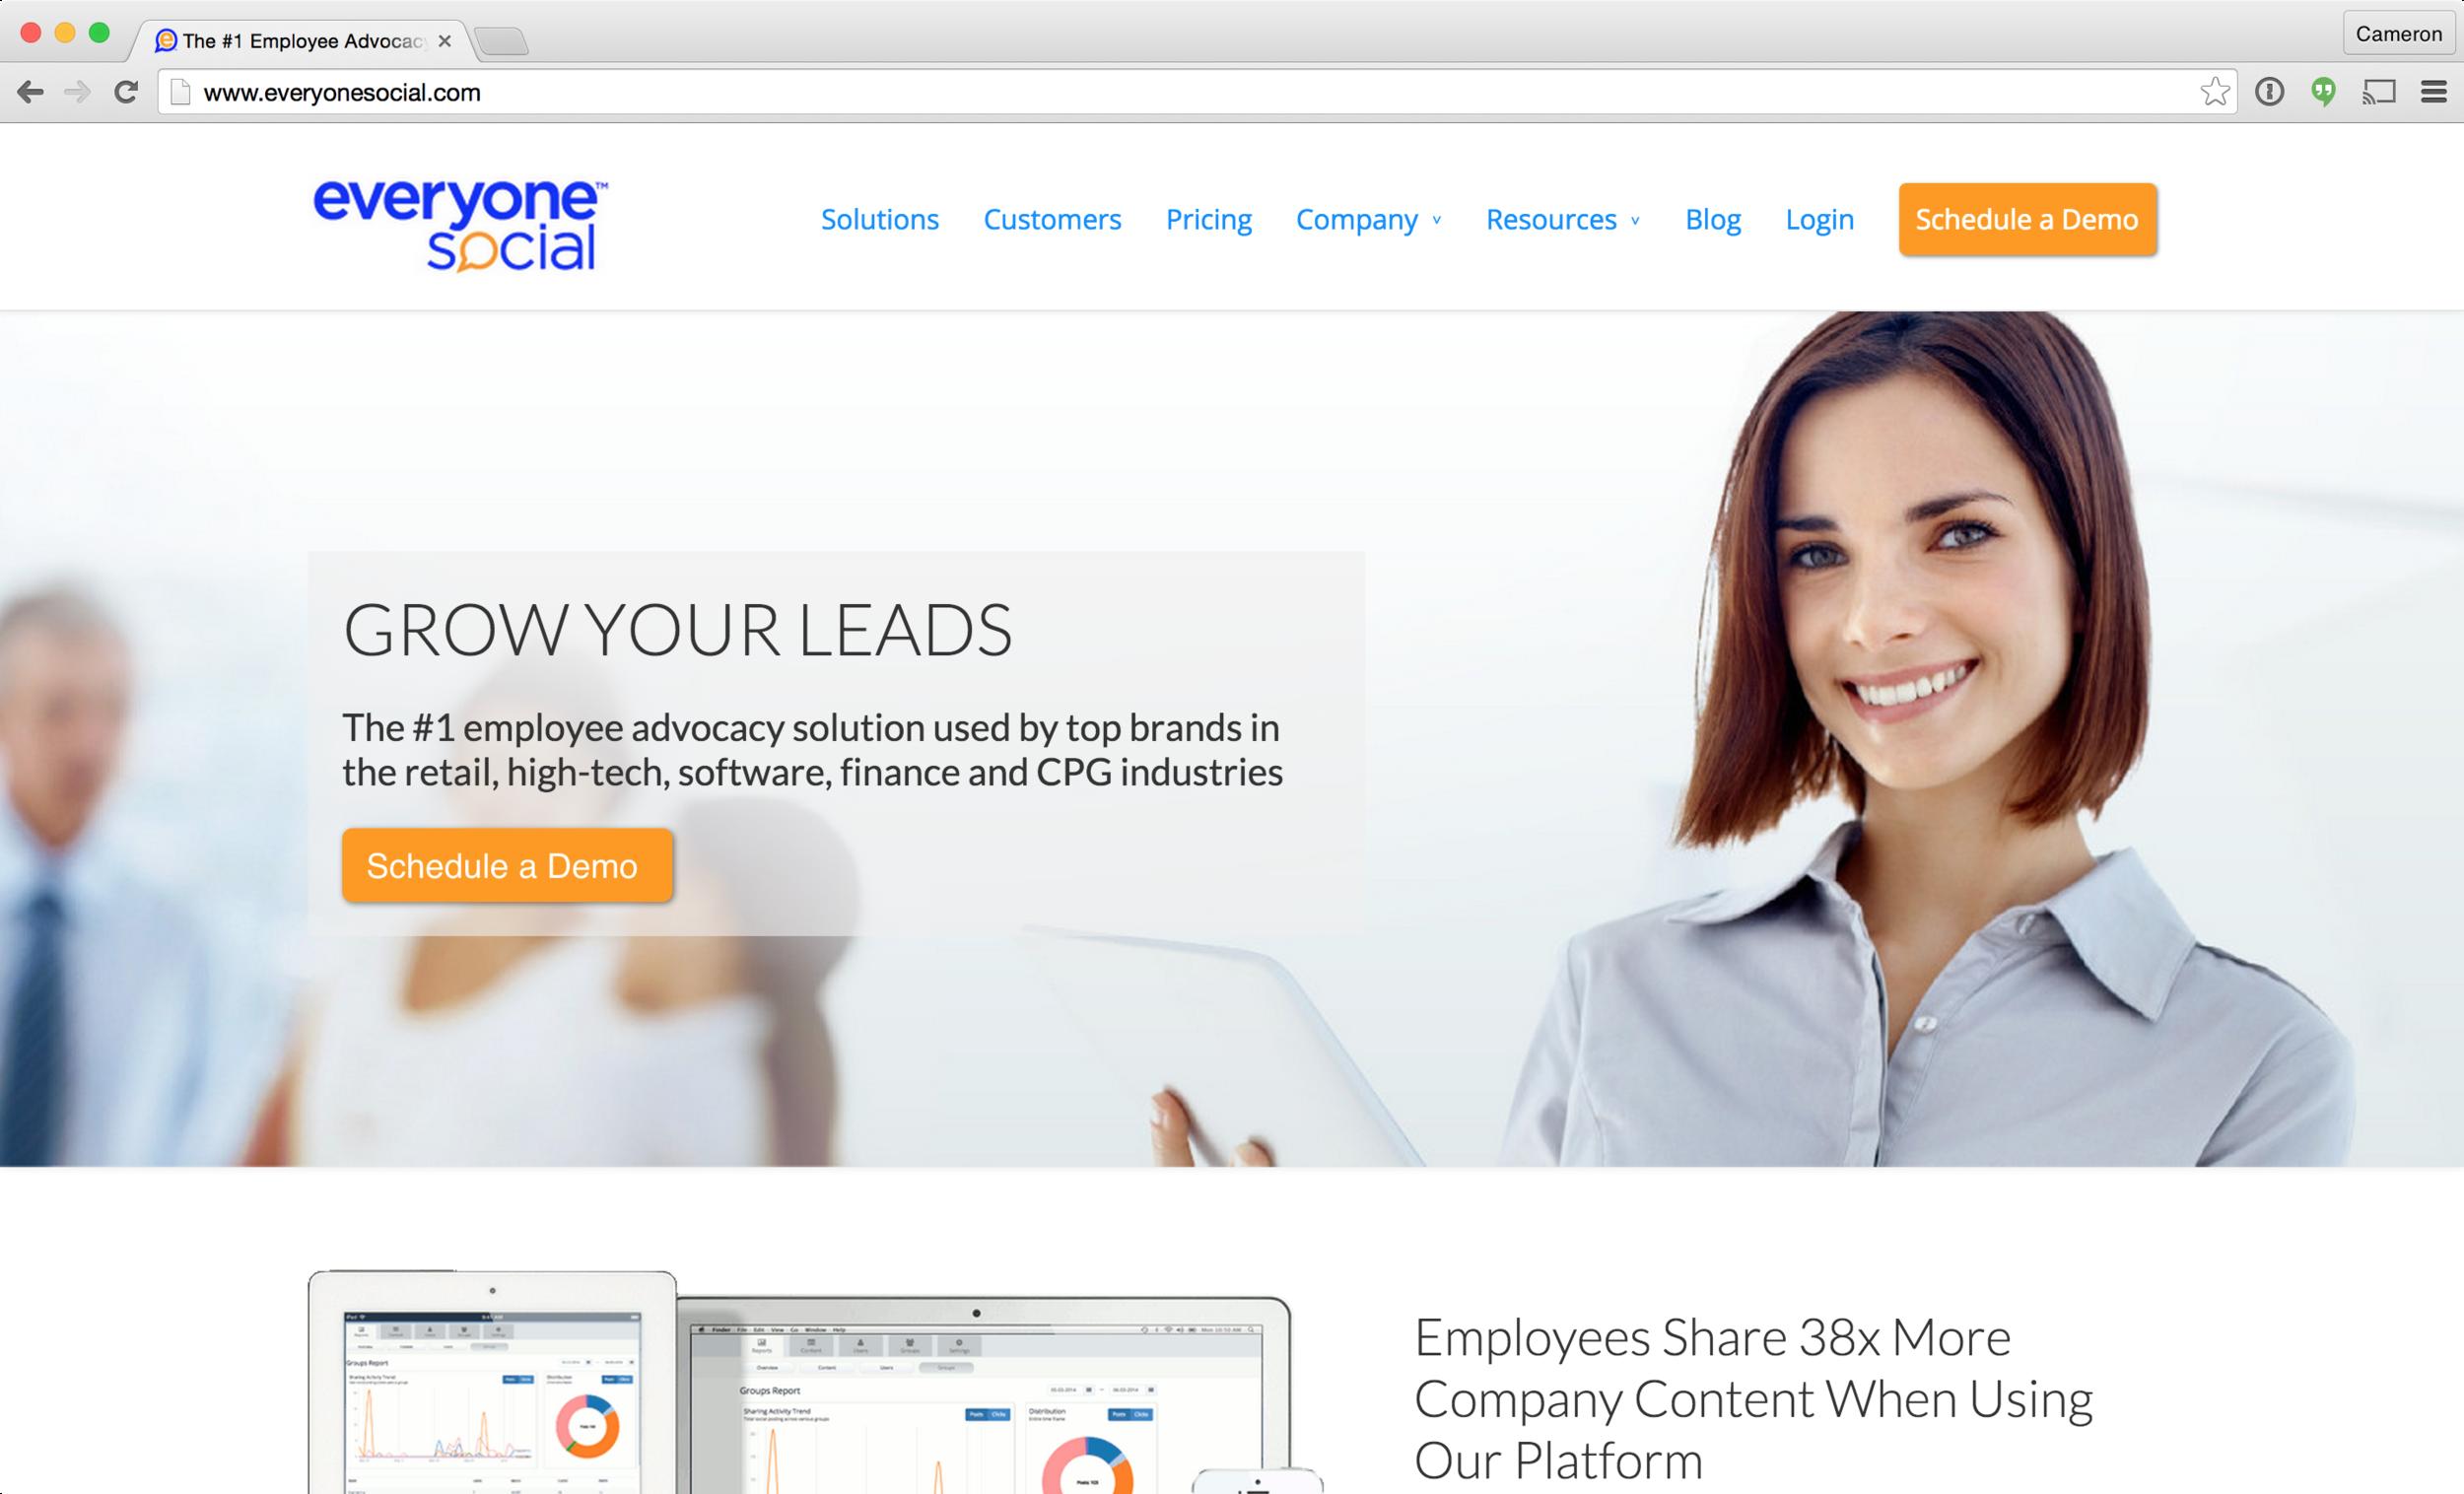 EveryoneSocial - Social publishing tools for employees.